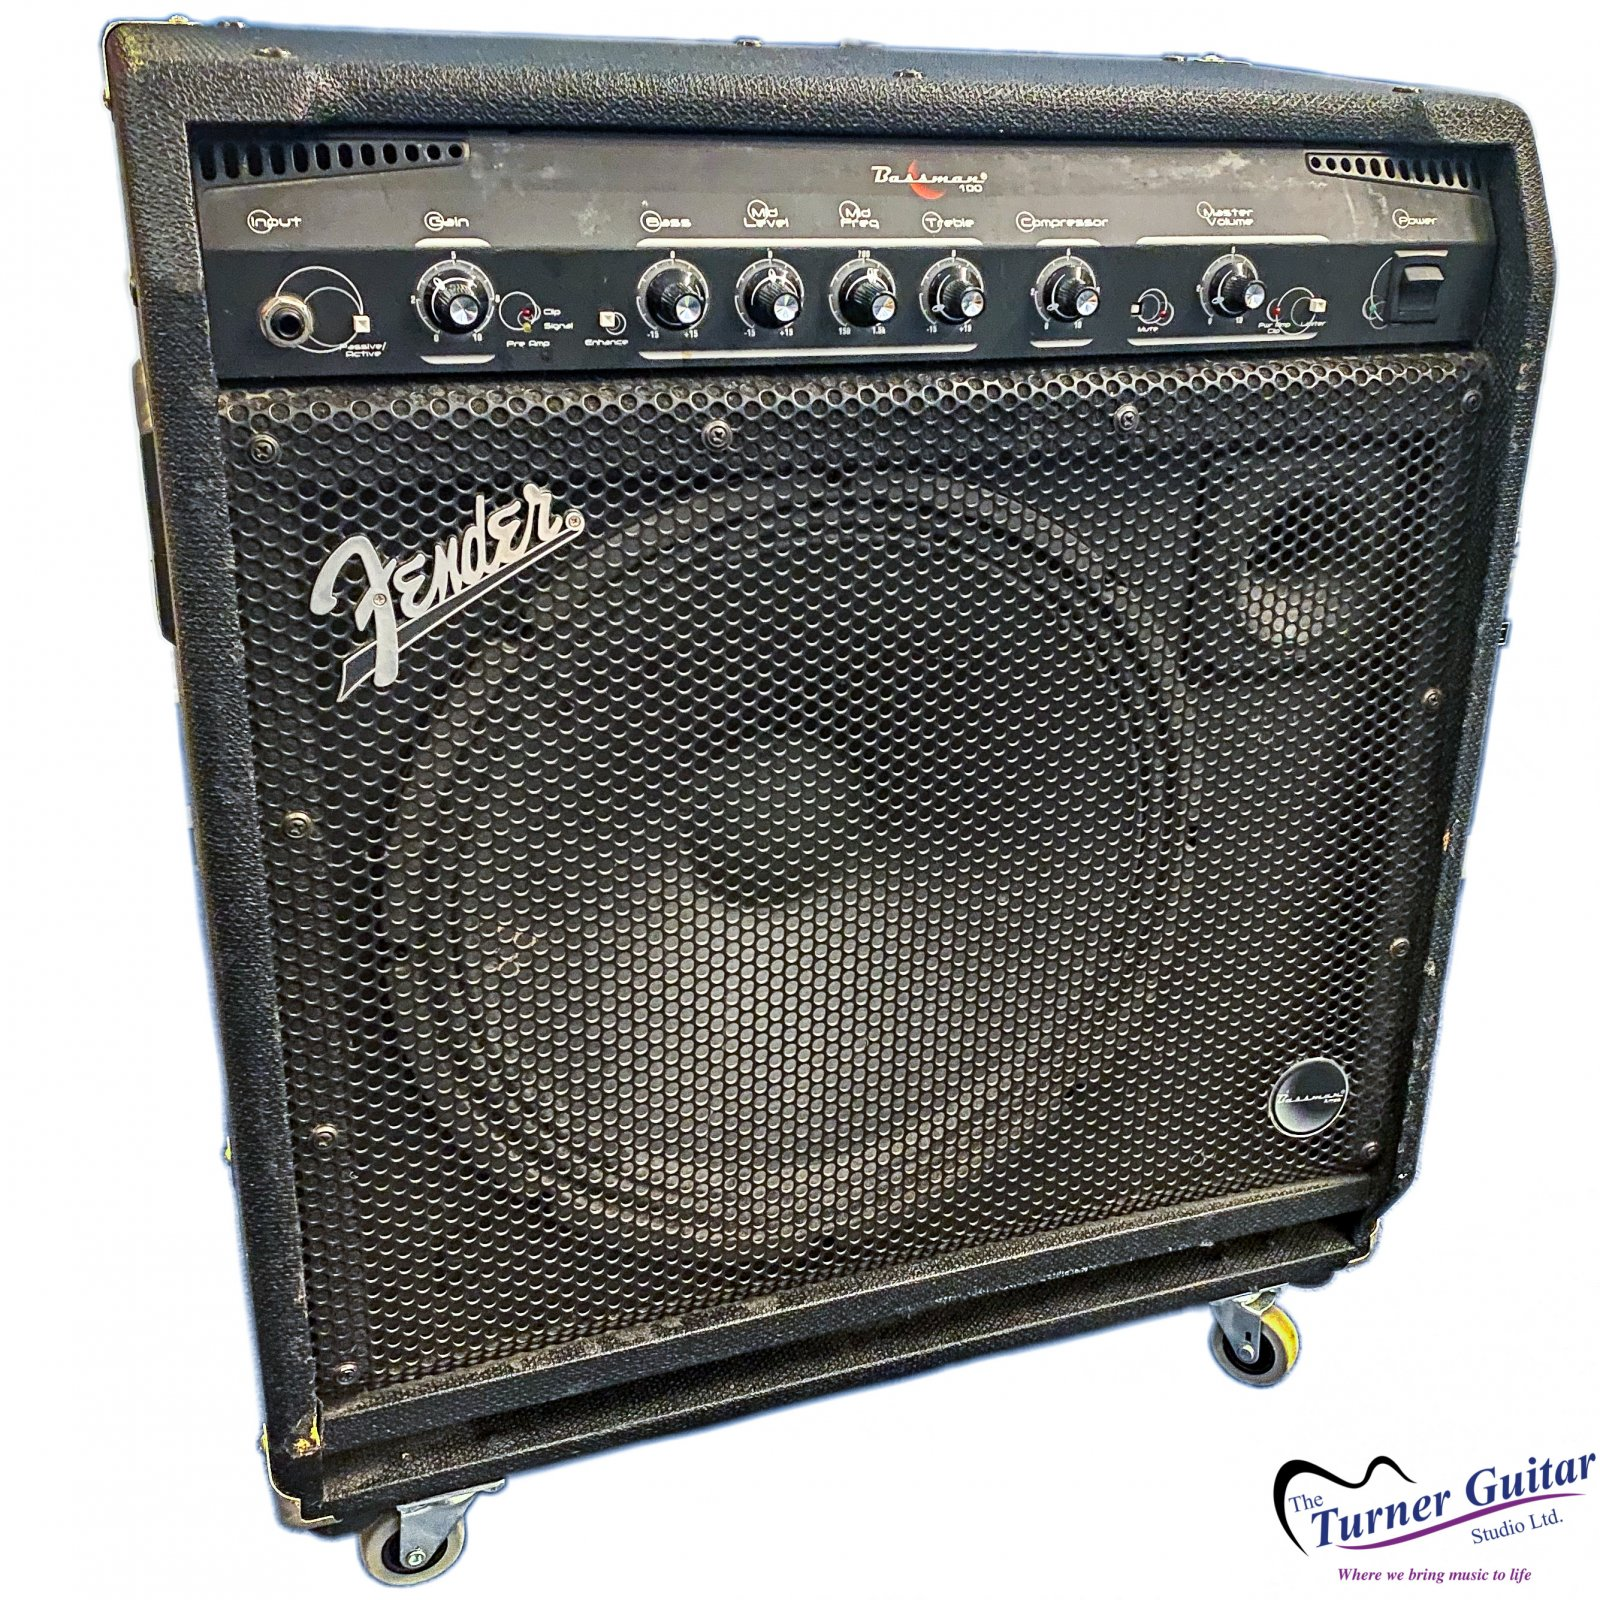 Fender Bassman 100 1x15 Bass Amplifier  - Very Good Condition Used